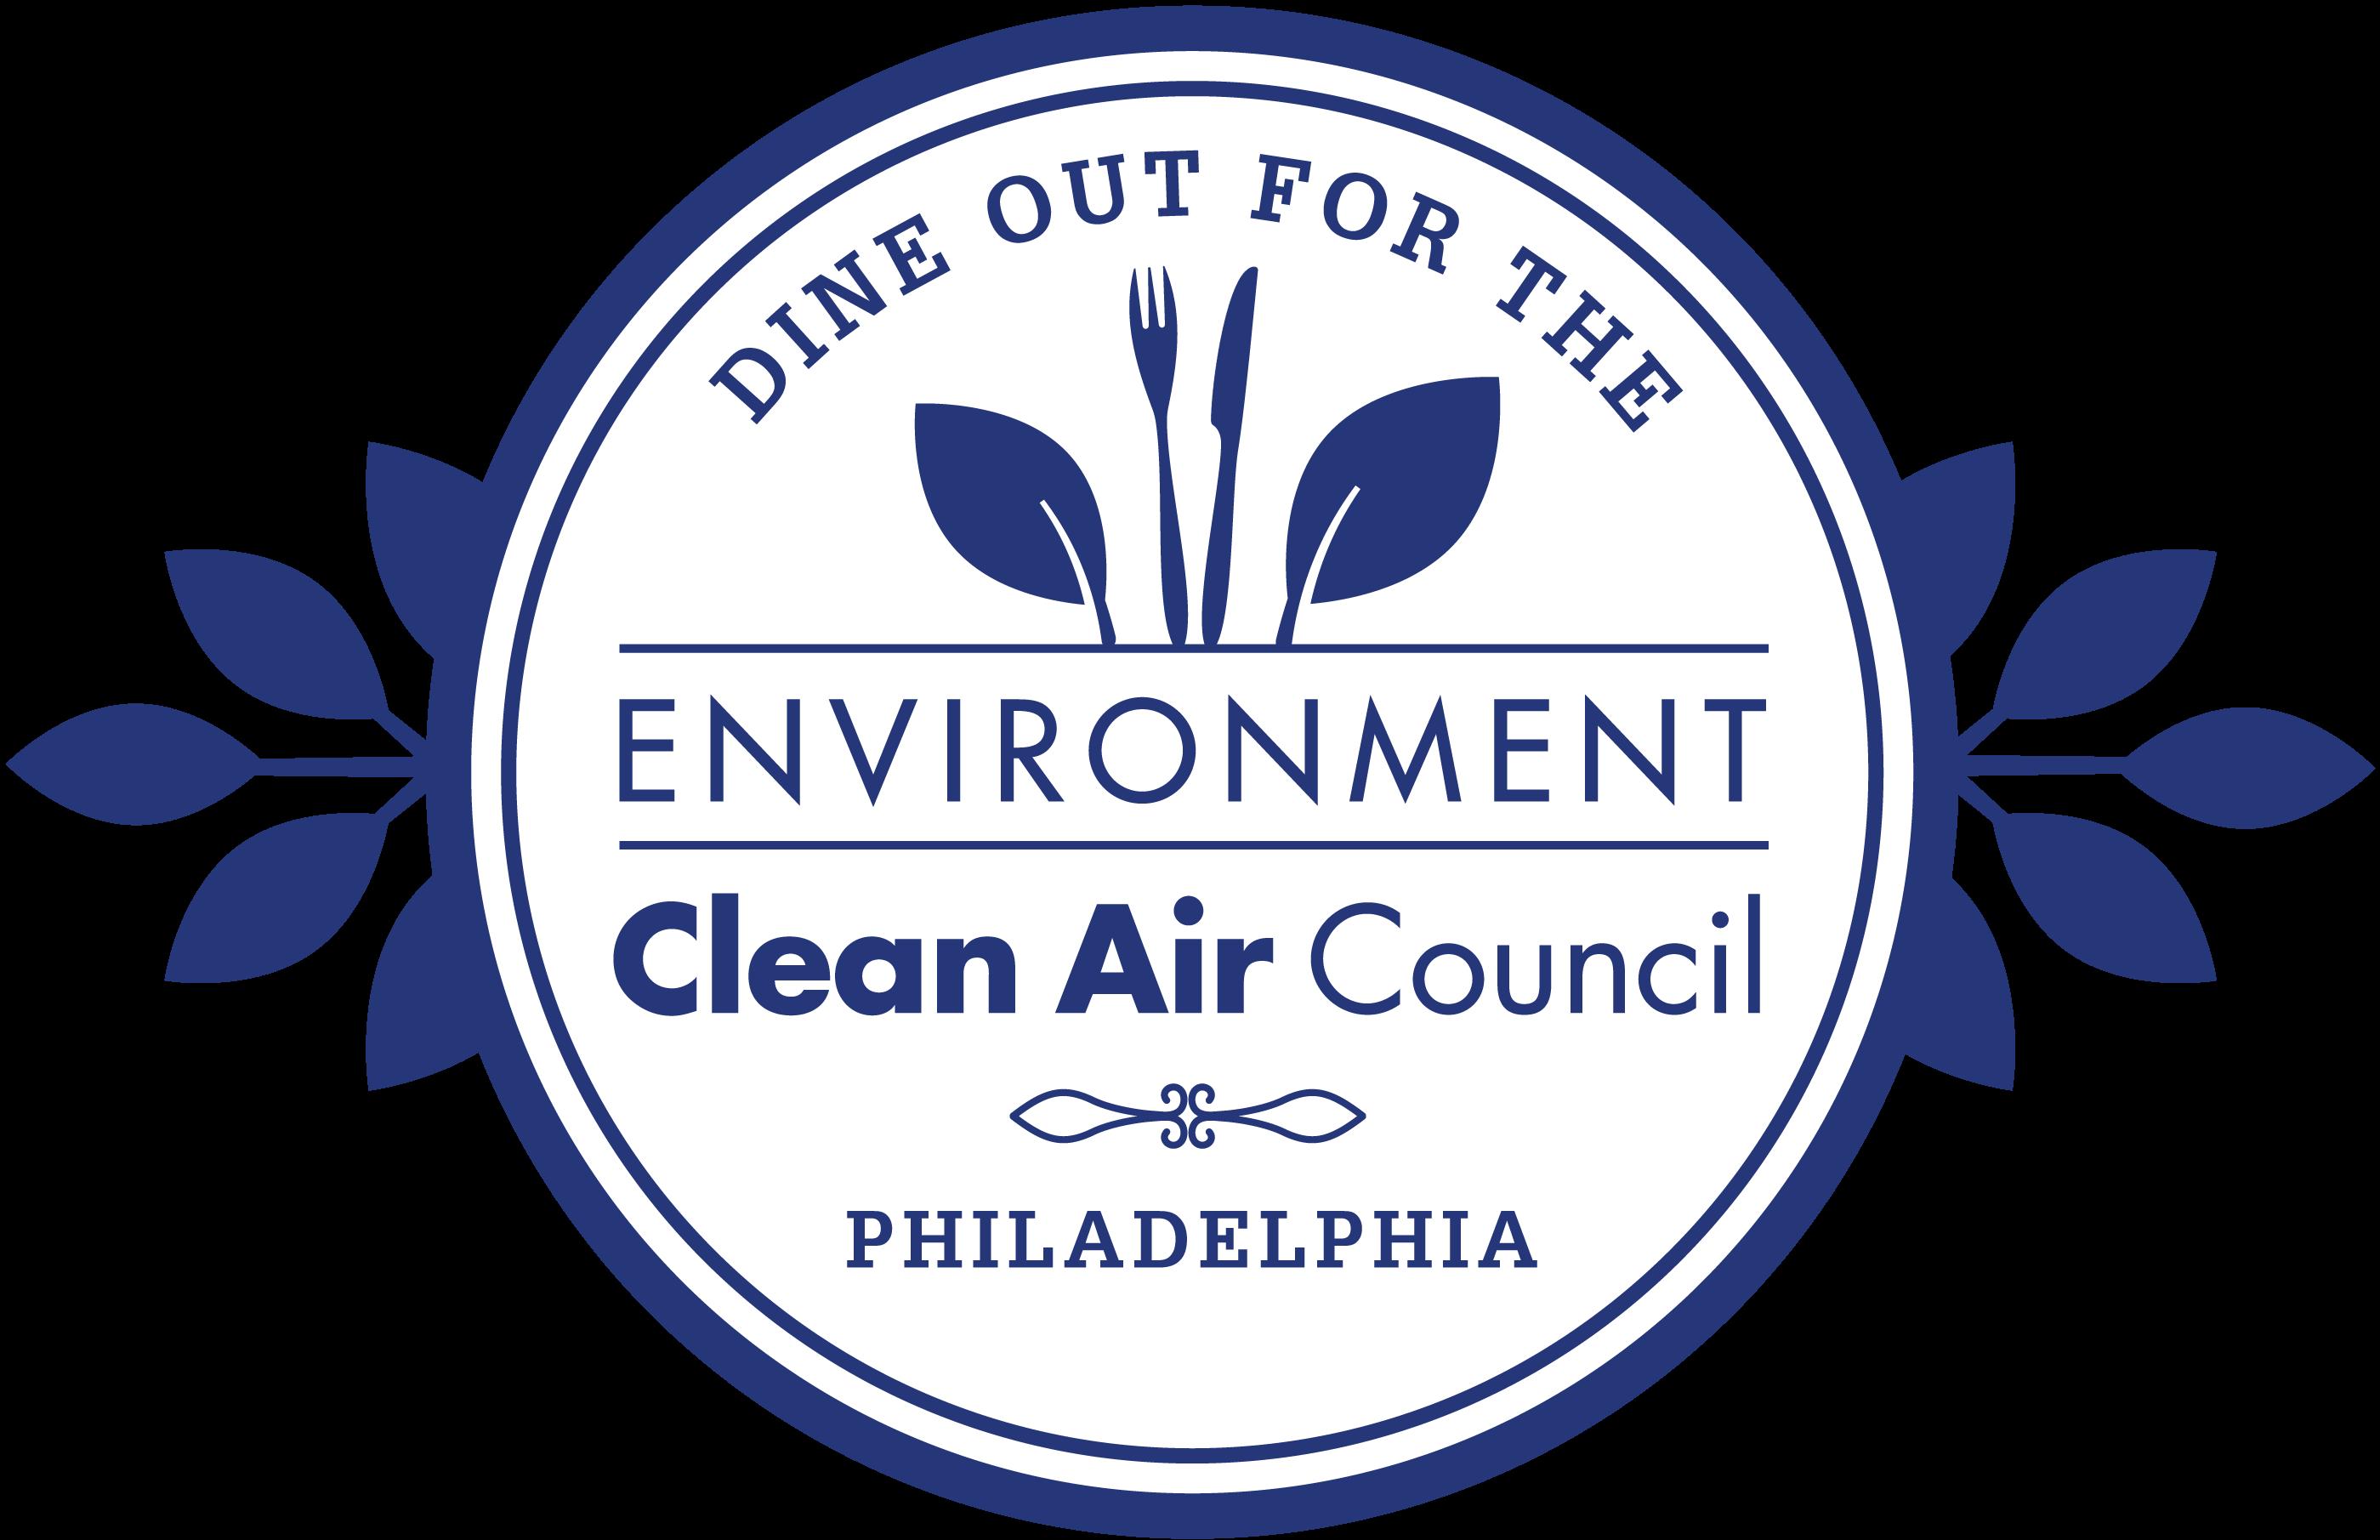 Environment clipart clean air. Council events dine out